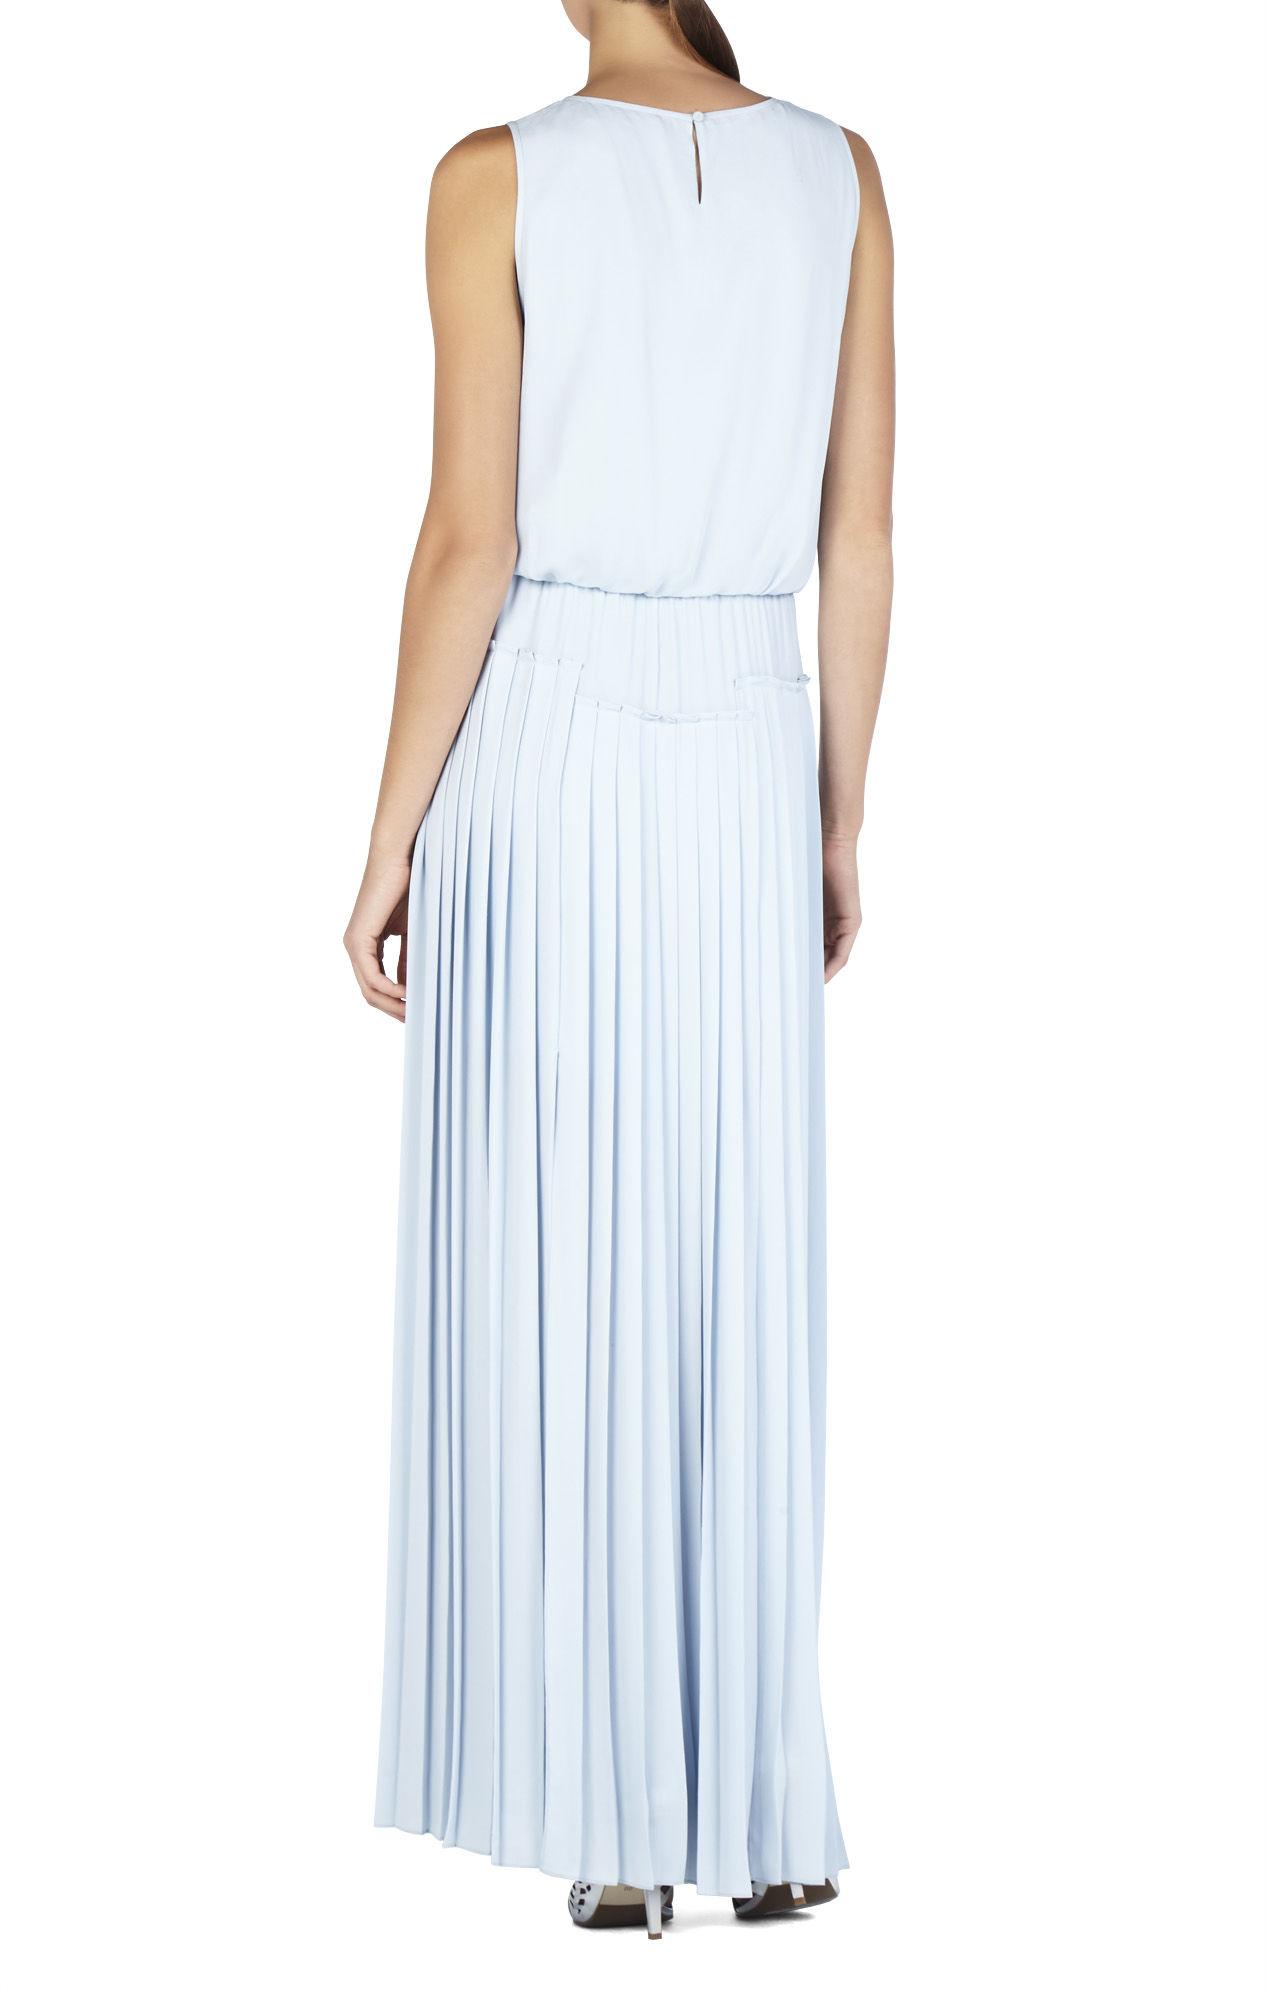 bcbgmaxazria jenine high slit pleated skirt maxi dress in